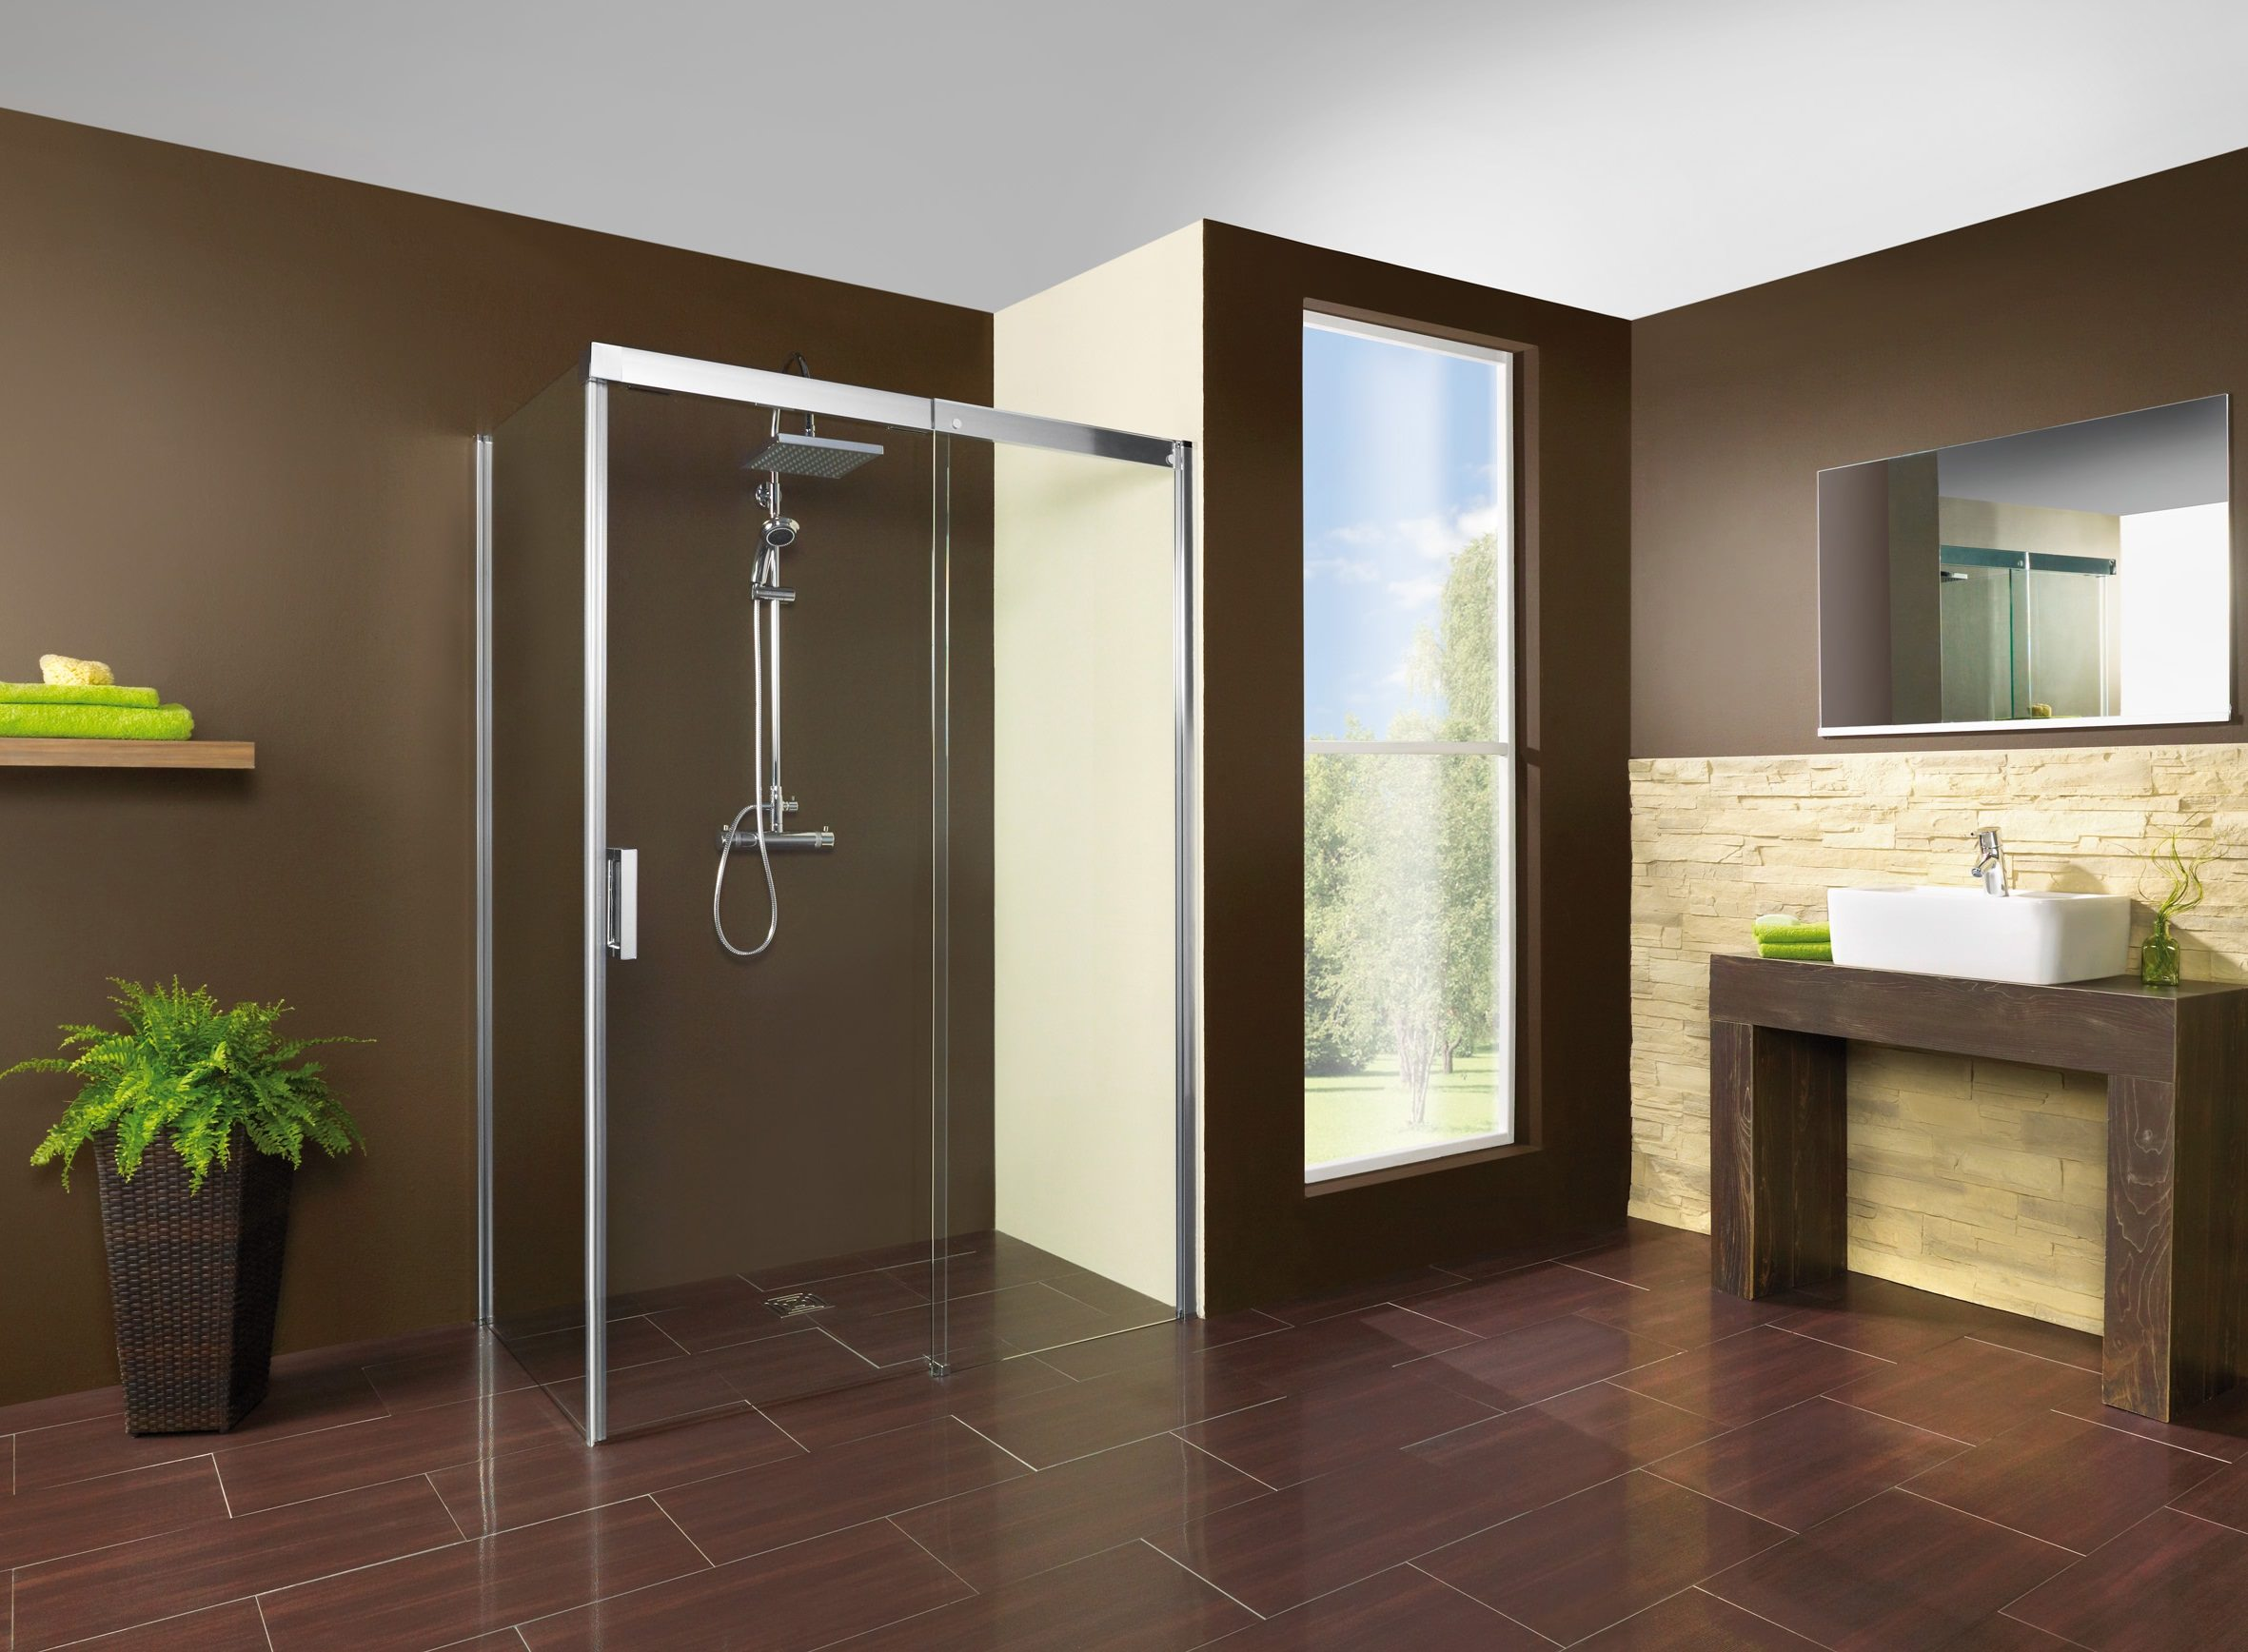 breuer panorama soft silent schiebet r f r seitenwand grau get nt alu chromeffekt 140cm. Black Bedroom Furniture Sets. Home Design Ideas